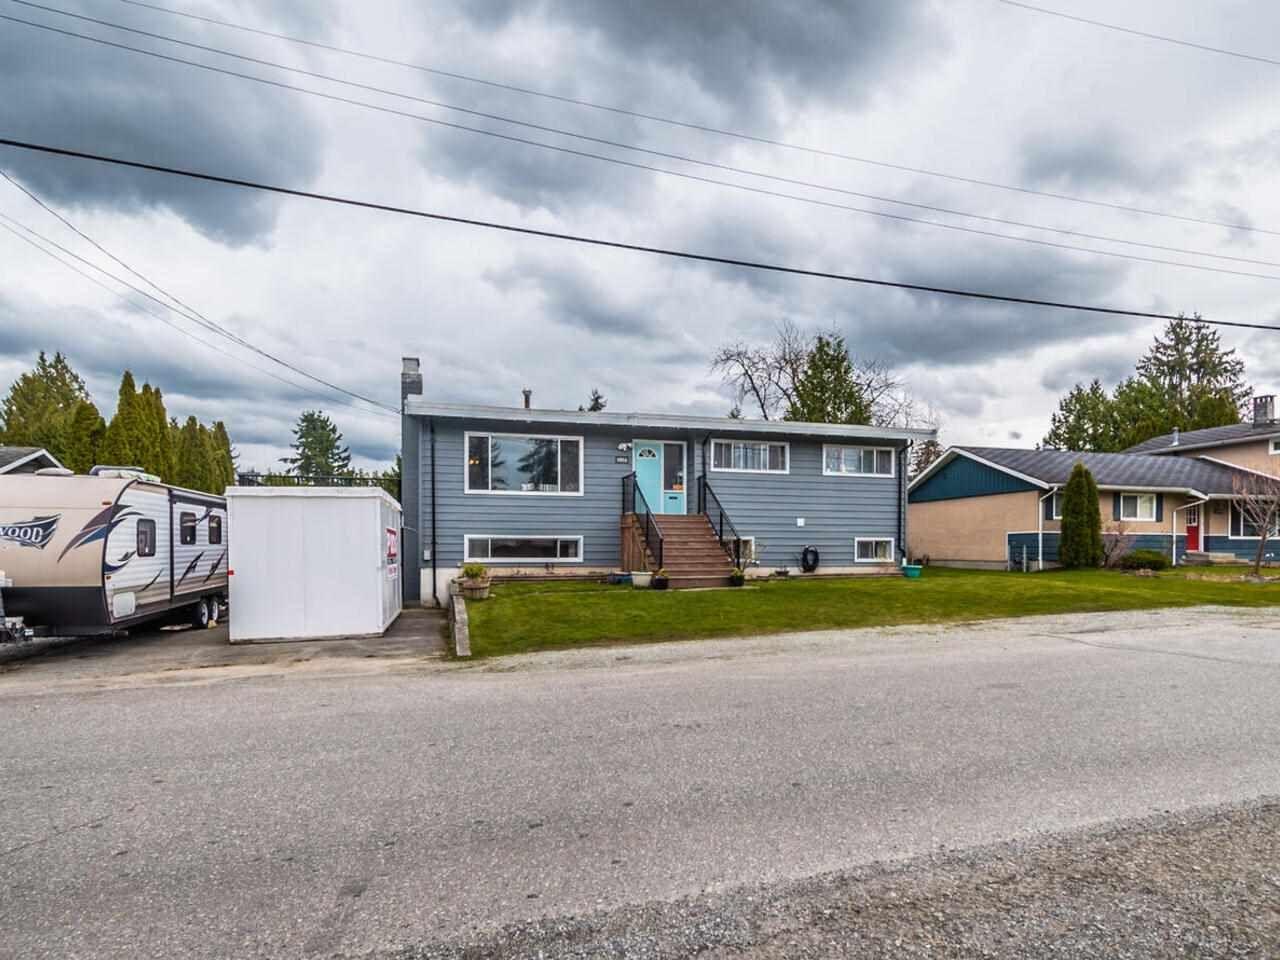 Main Photo: 11936 HAWTHORNE Street in Maple Ridge: Cottonwood MR House for sale : MLS®# R2572645